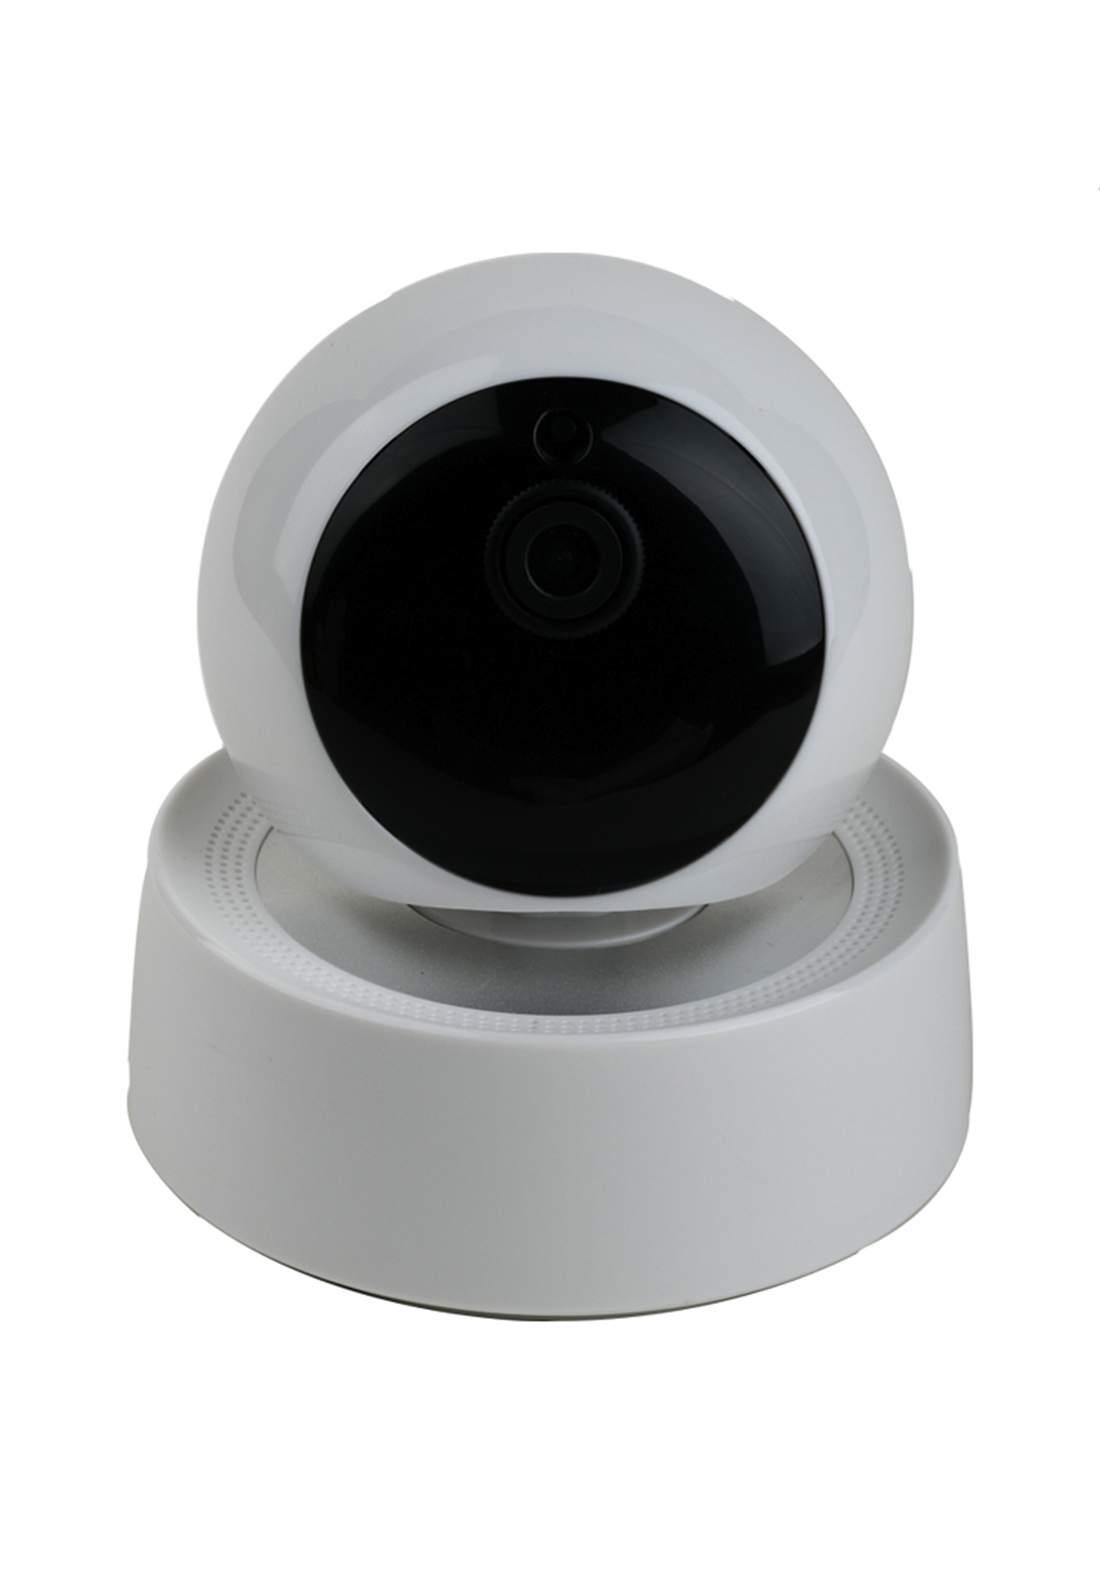 كاميرا مراقبة Sonoff GK-200MP